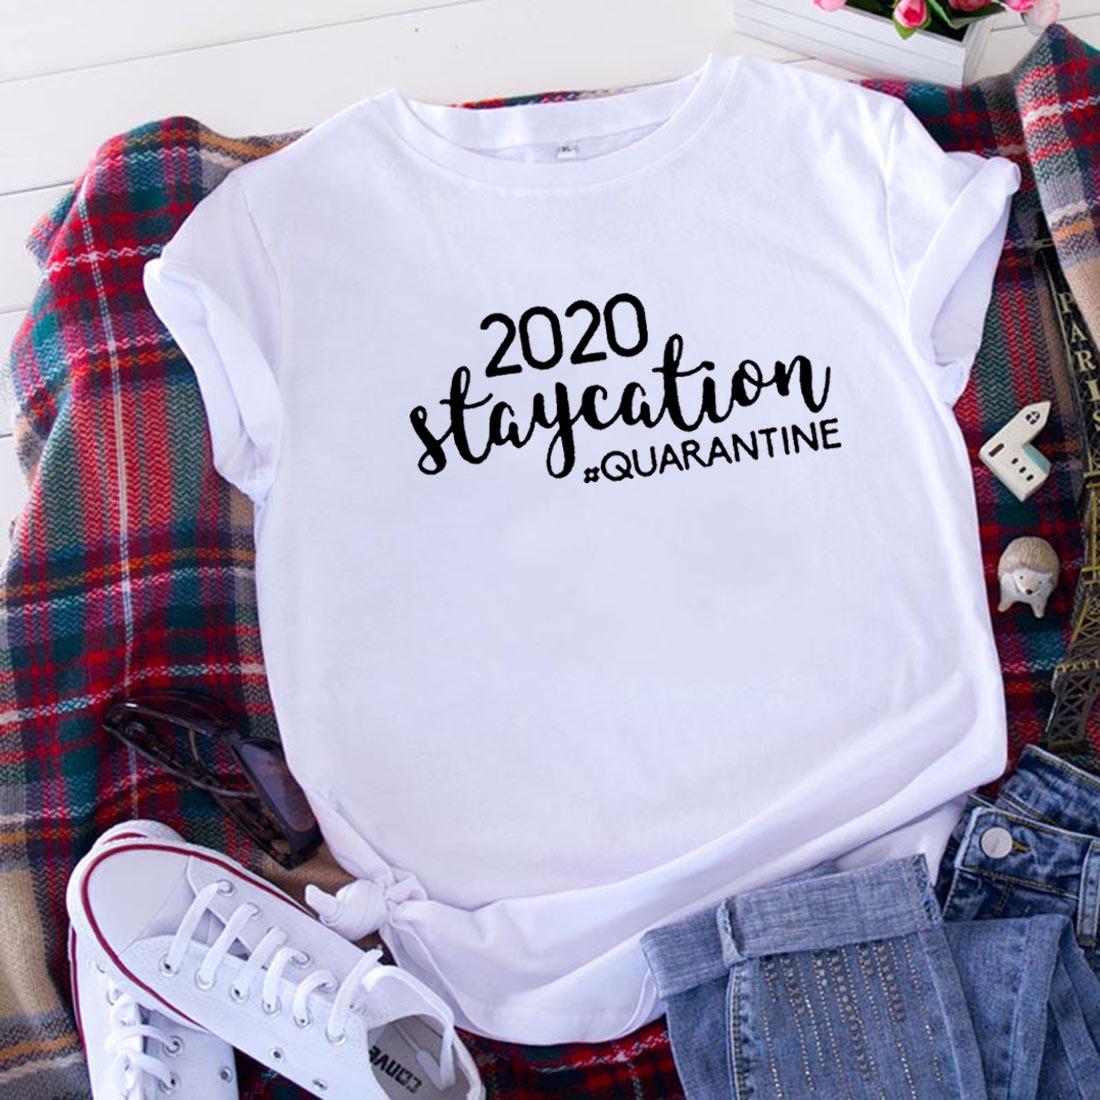 2020 Staycation T Shirt Women Top Summer Harajuku Tshirt Women Cotton Short Sleeve Camiseta Mujer Casual Tee Shirt Femme T-shirt